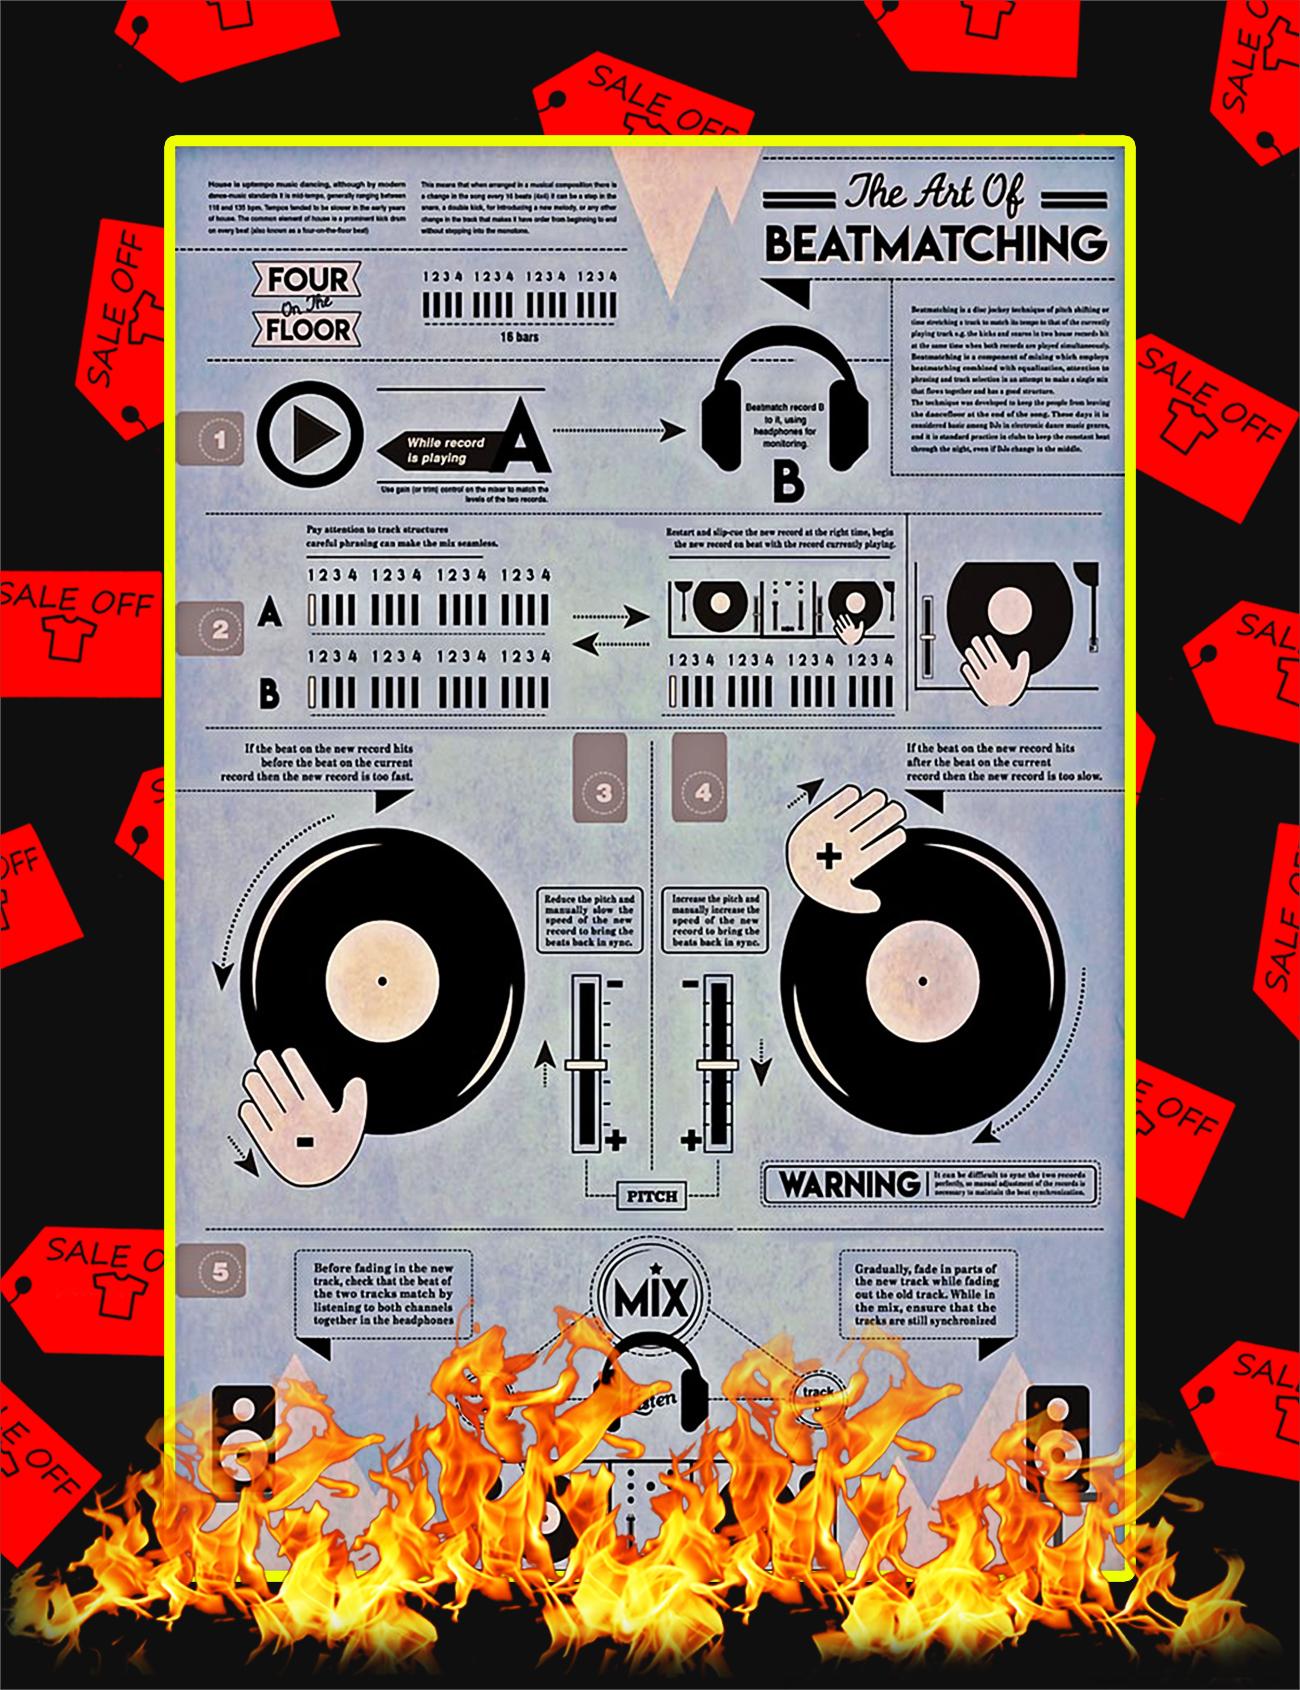 The Art Of Beatmatching Poster - 24x36